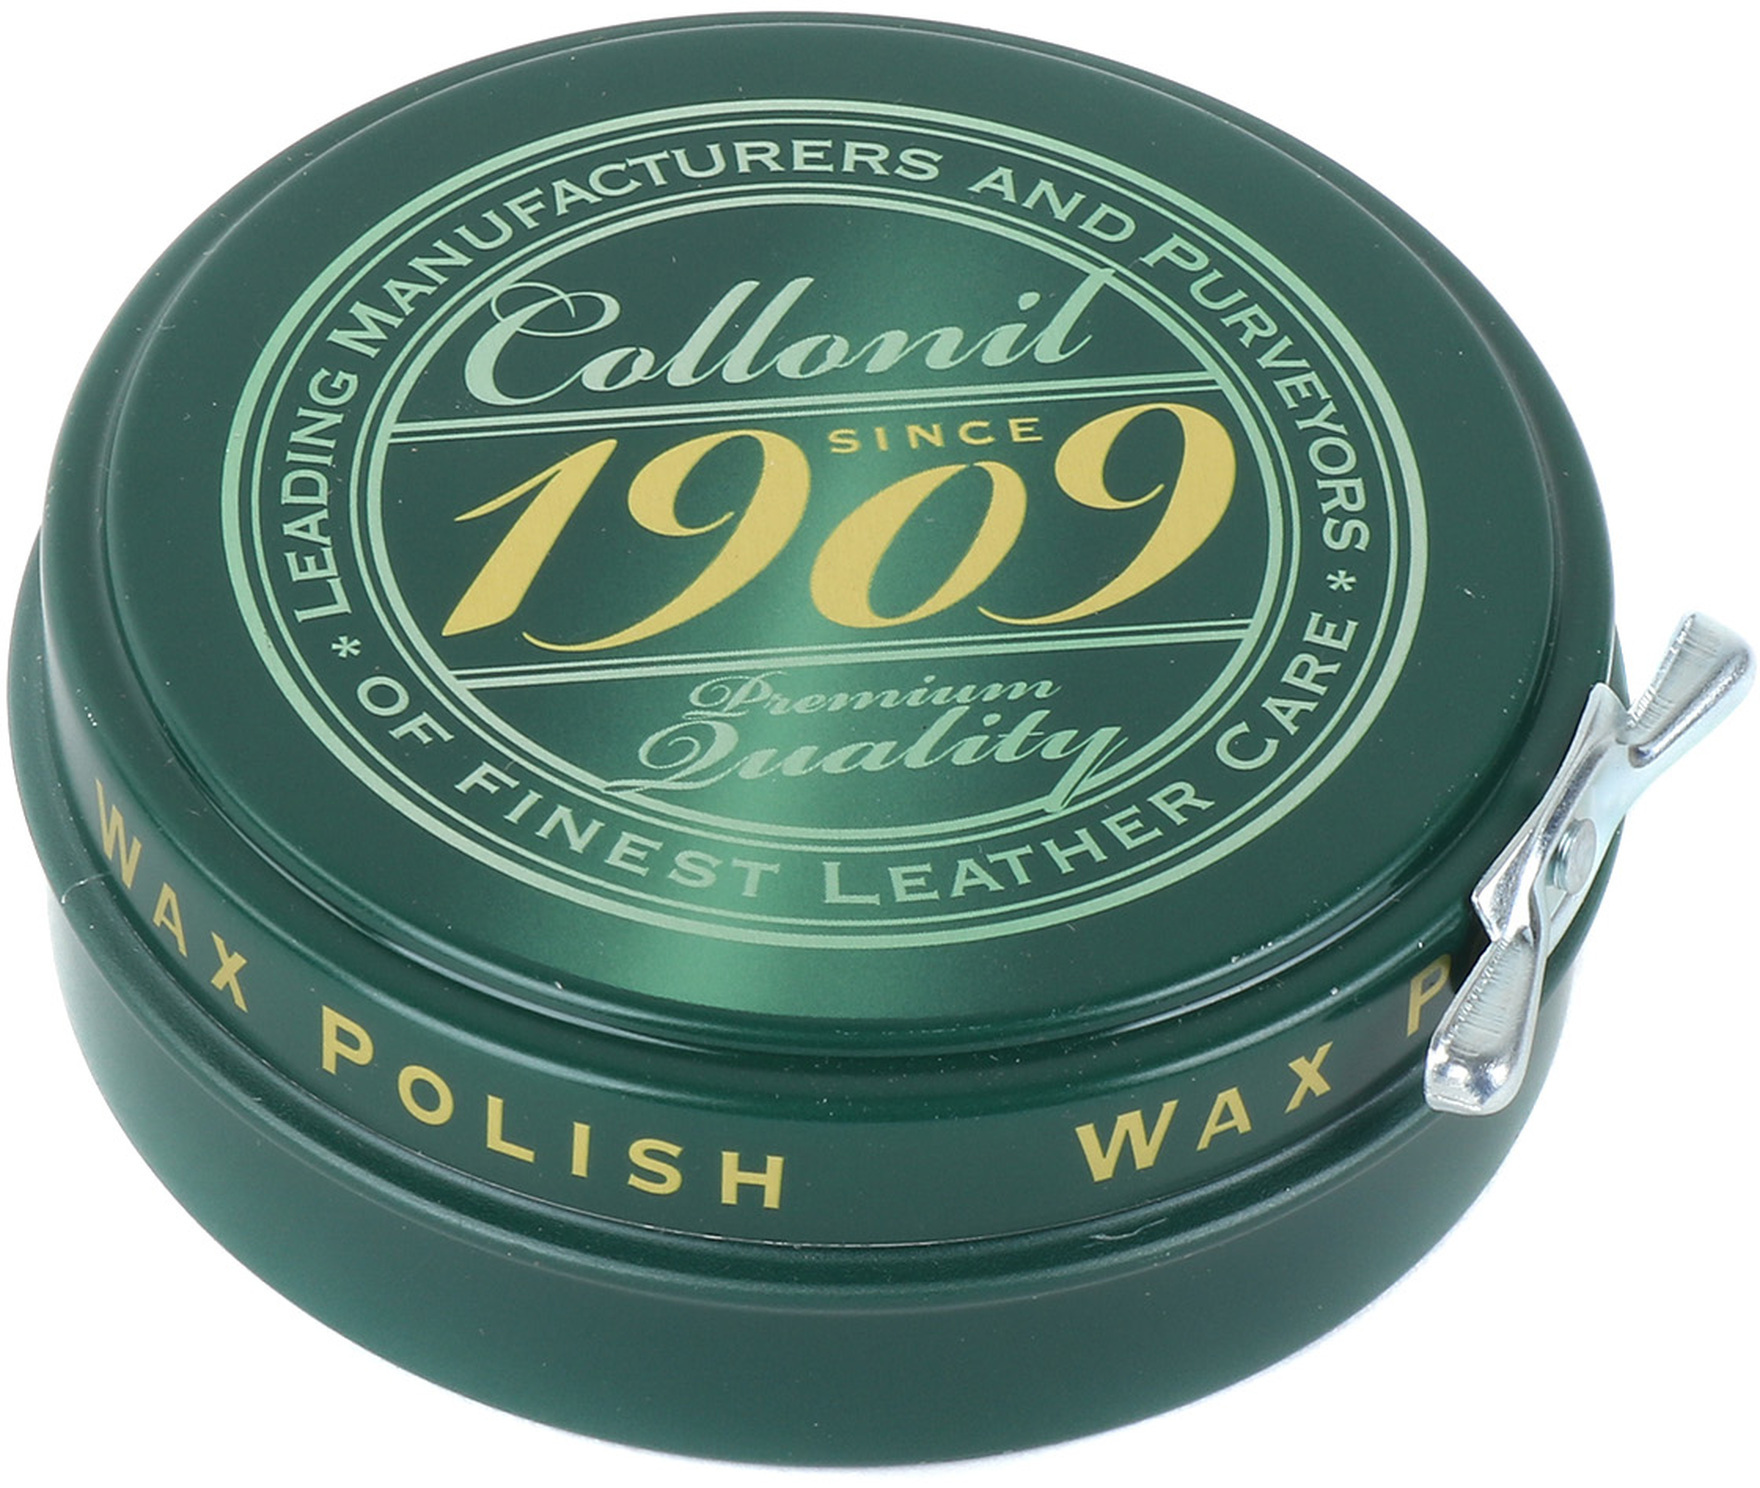 Collonil 1909 Wax Polish Kleurloos